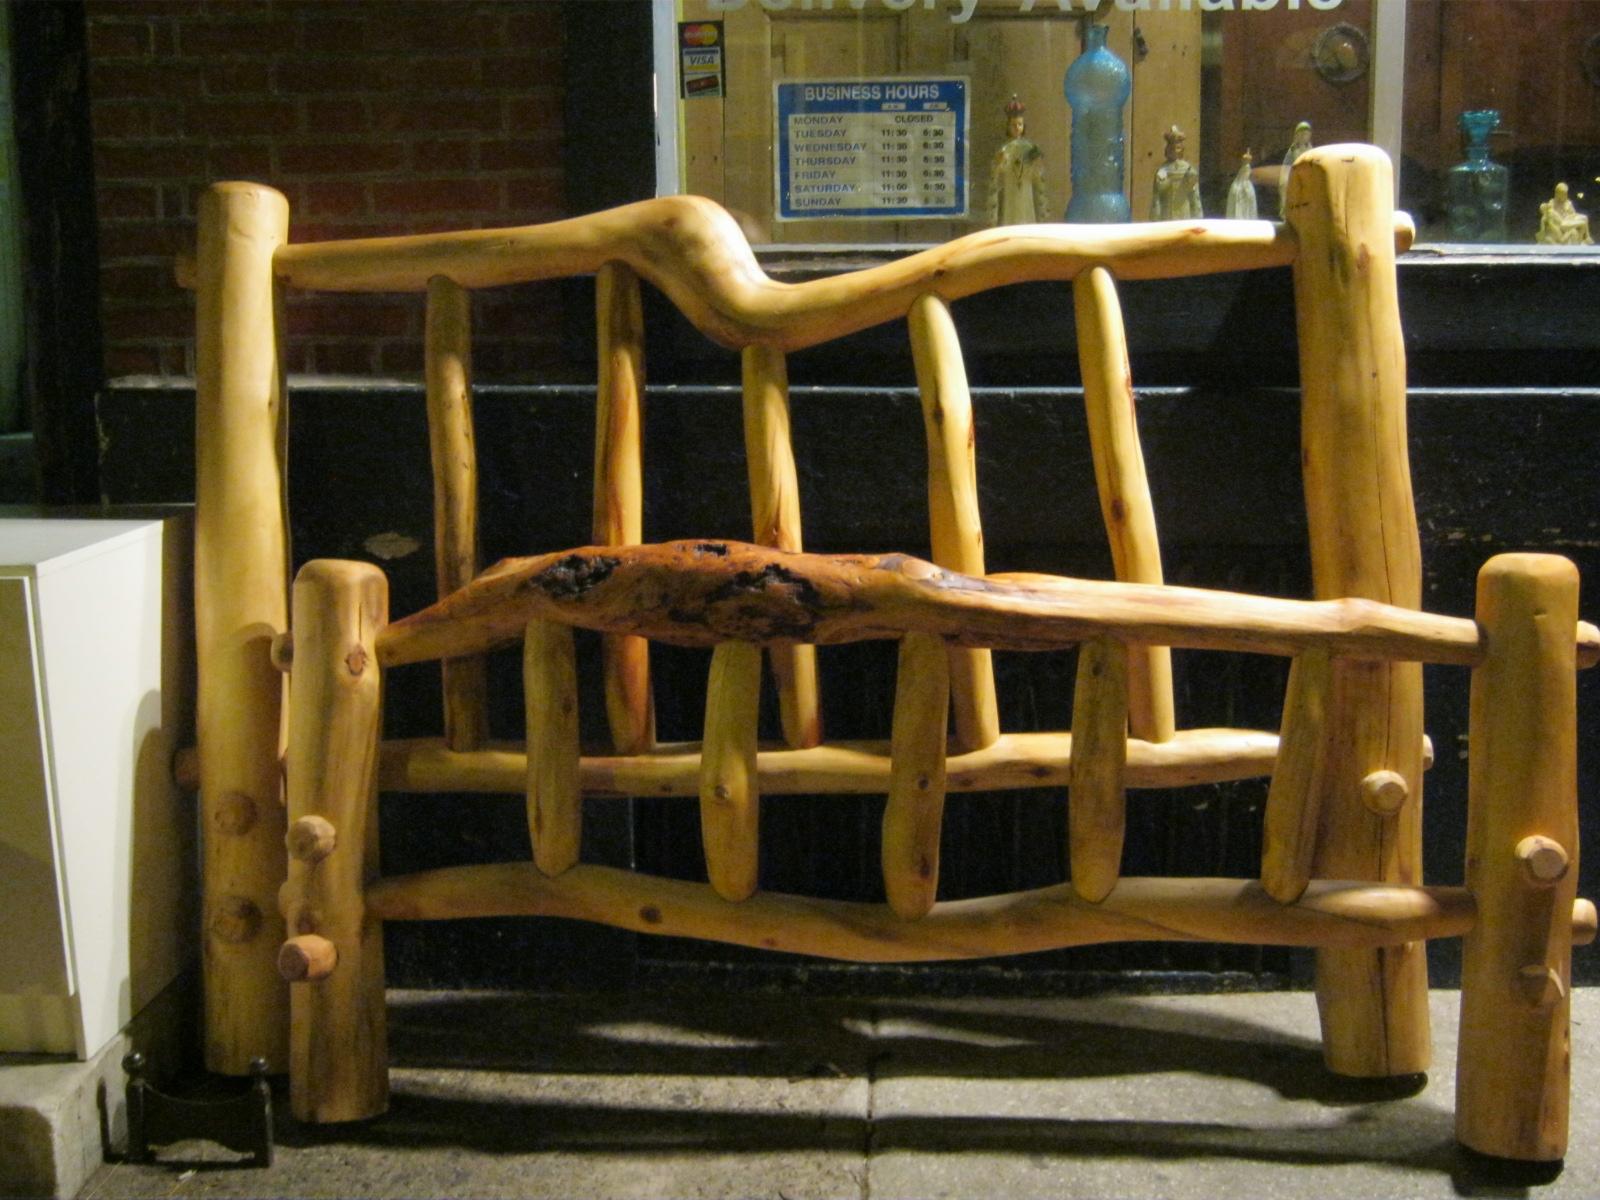 Fred Flintstone Rustic Aspenwood Bed SOLD